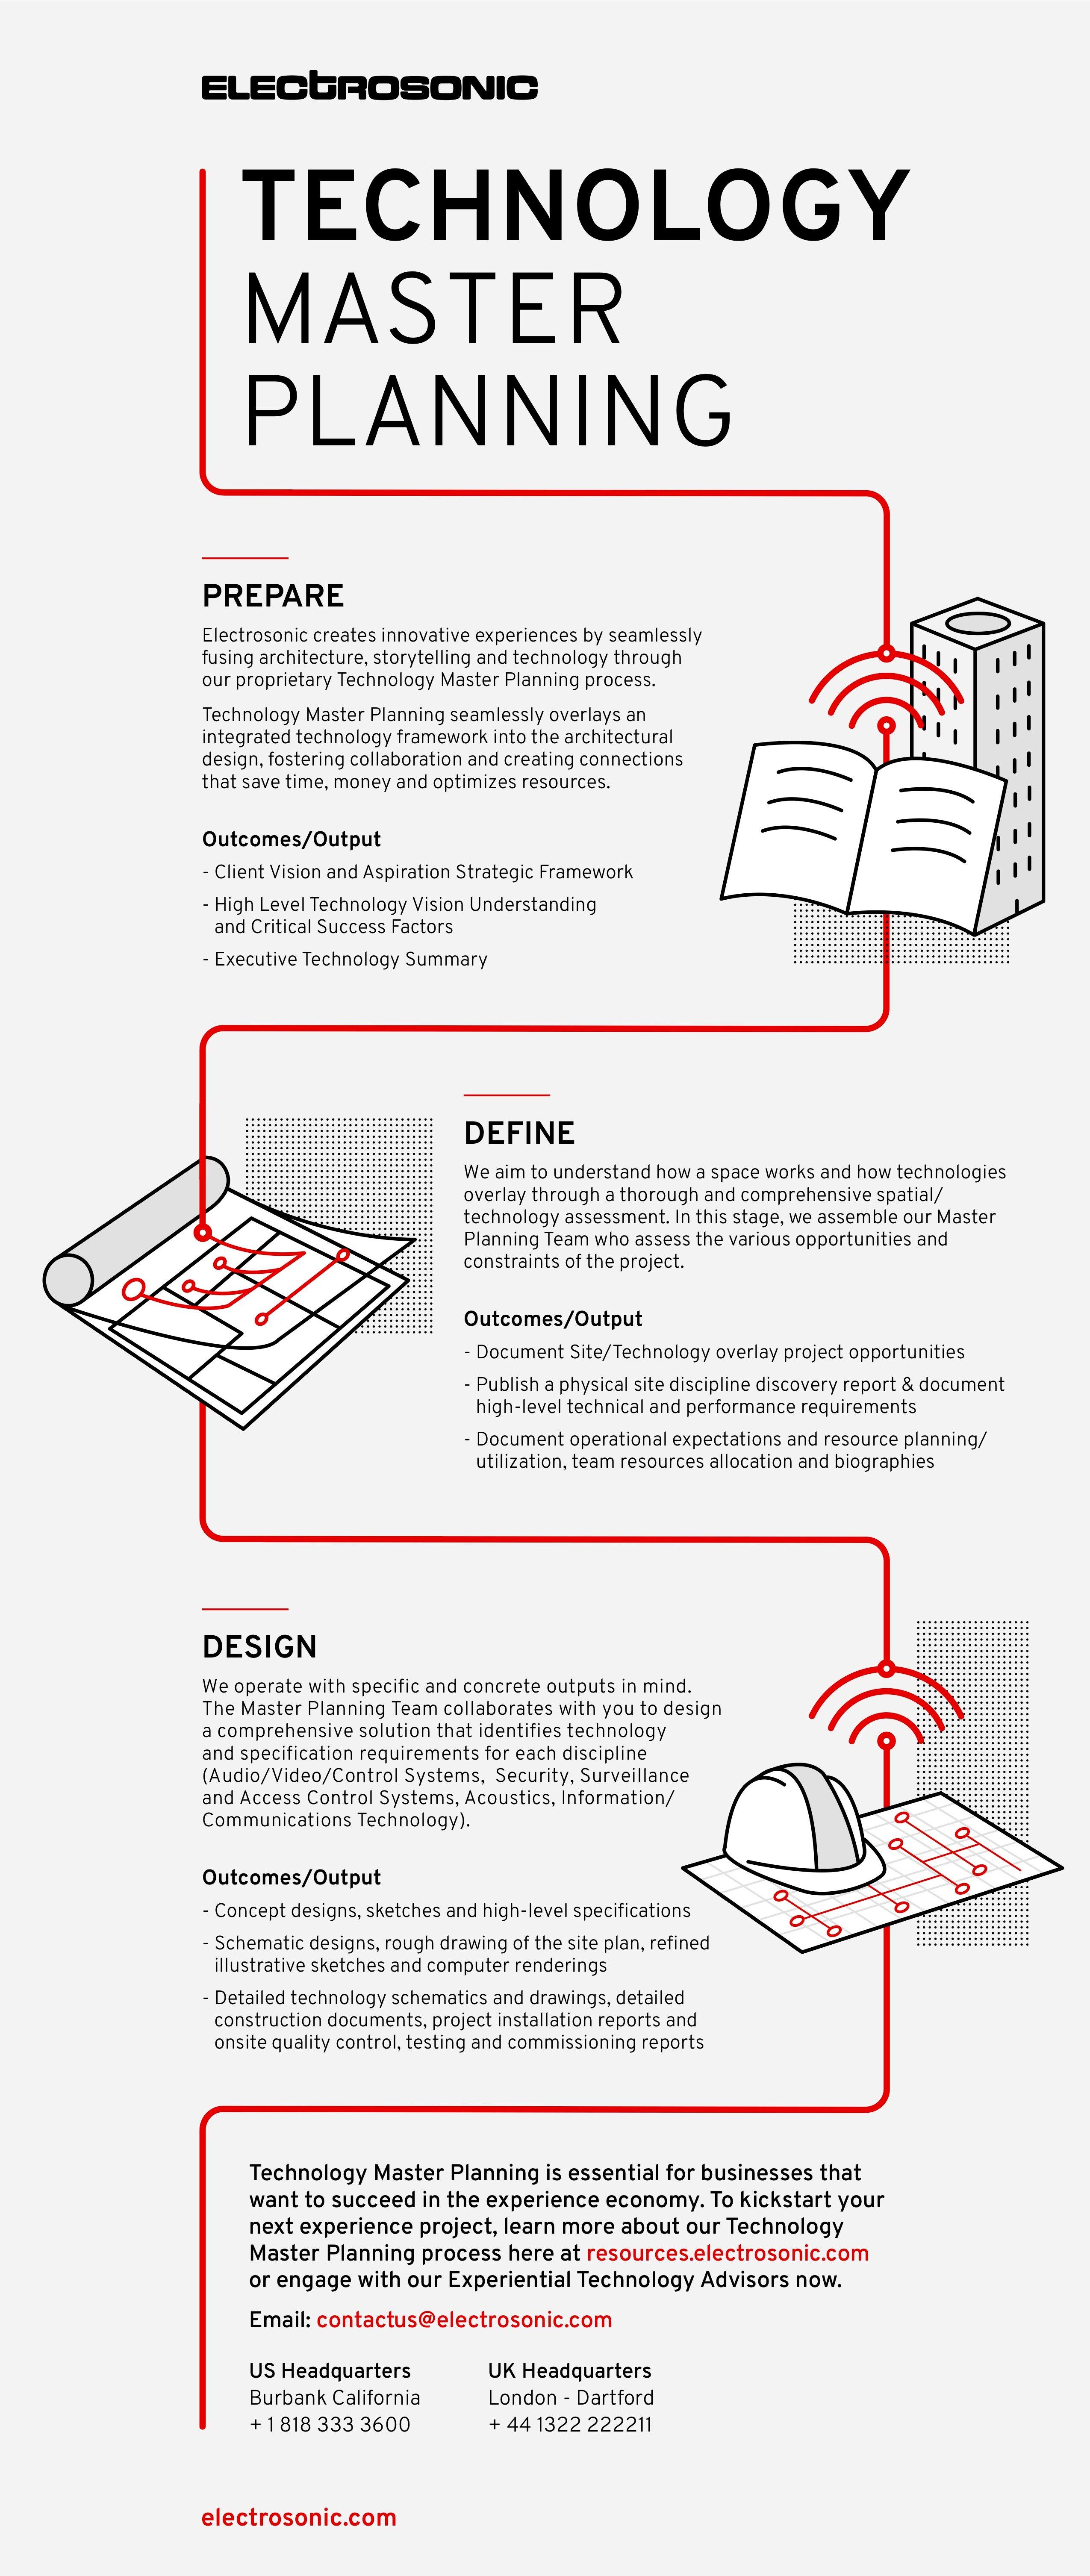 Understanding Electrosonic's  technology master planning process.